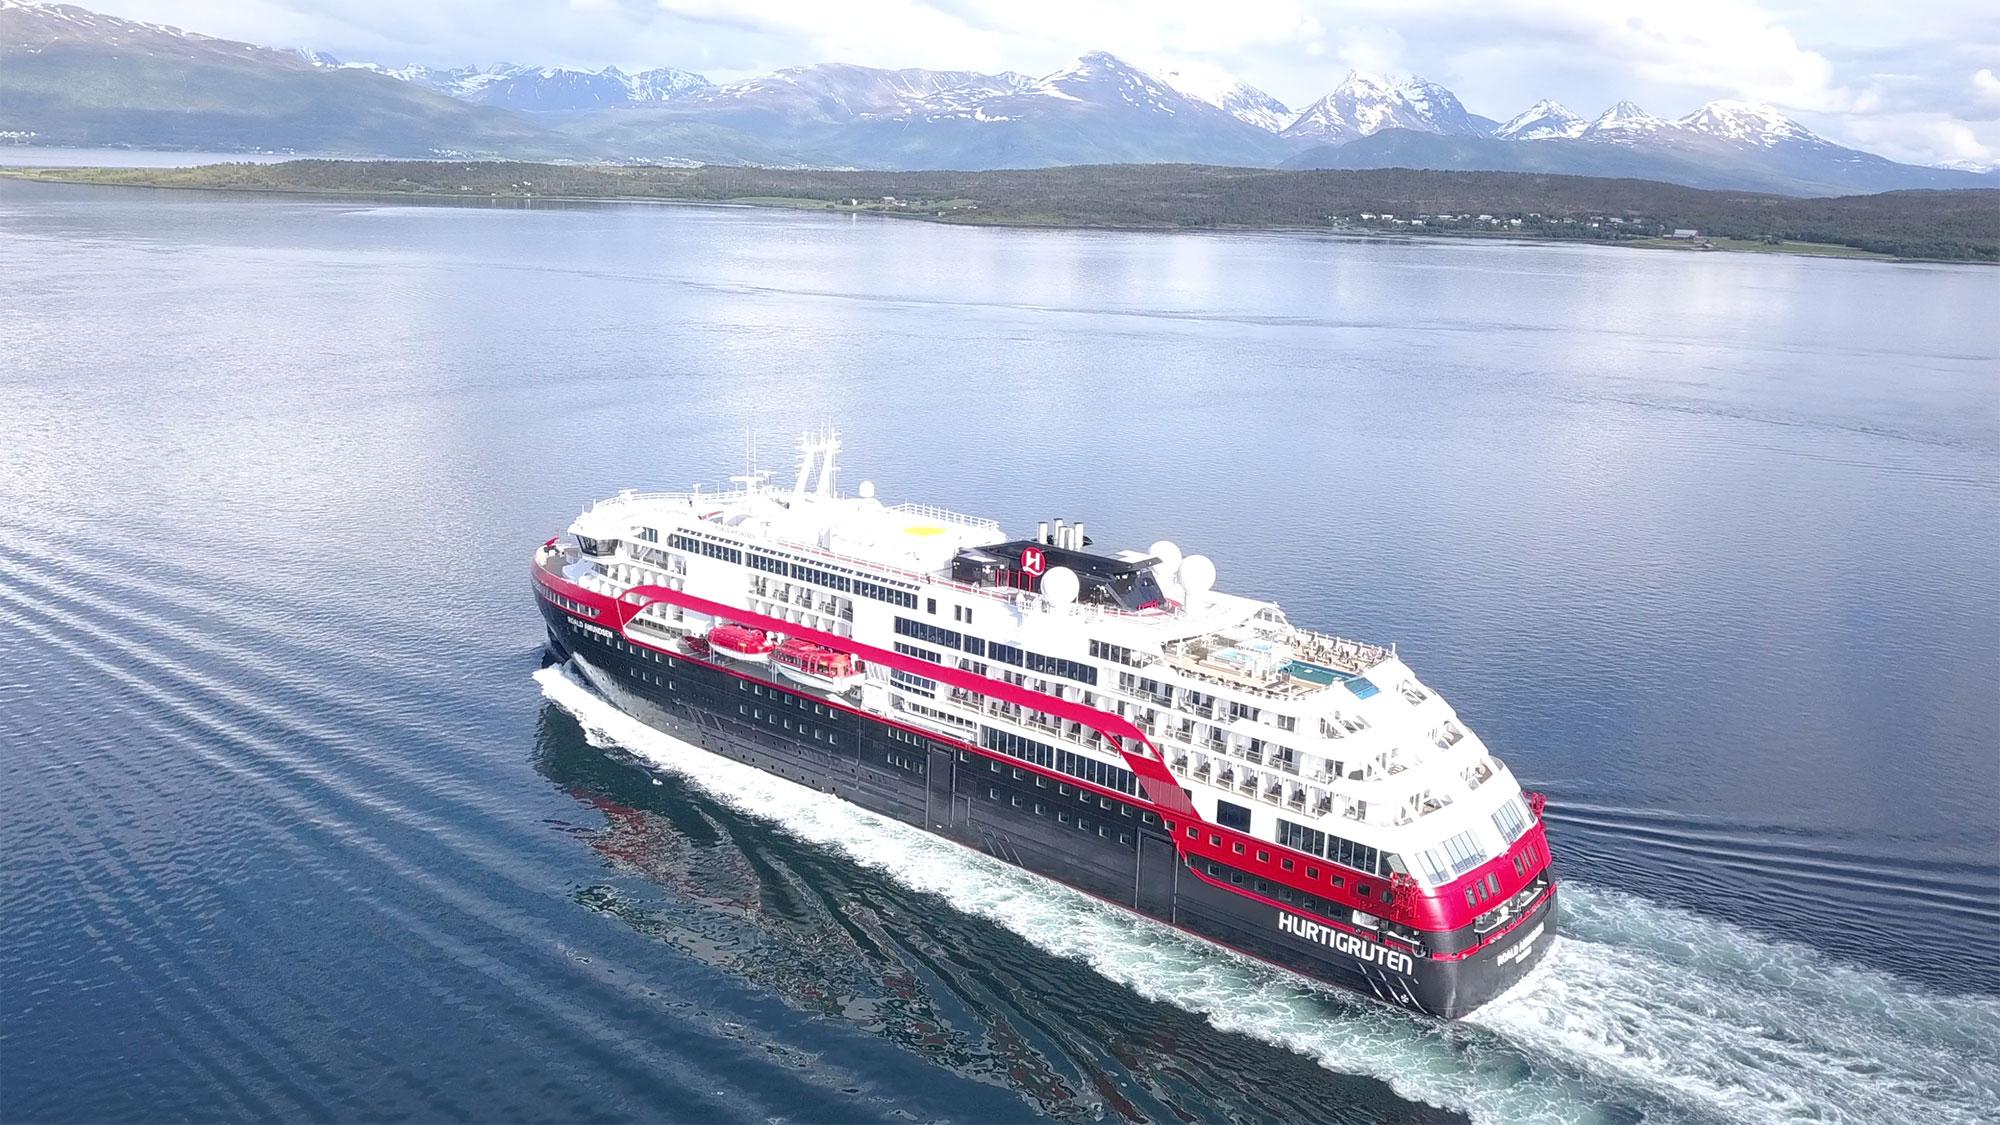 MSC and Hurtigruten detail their green initiatives